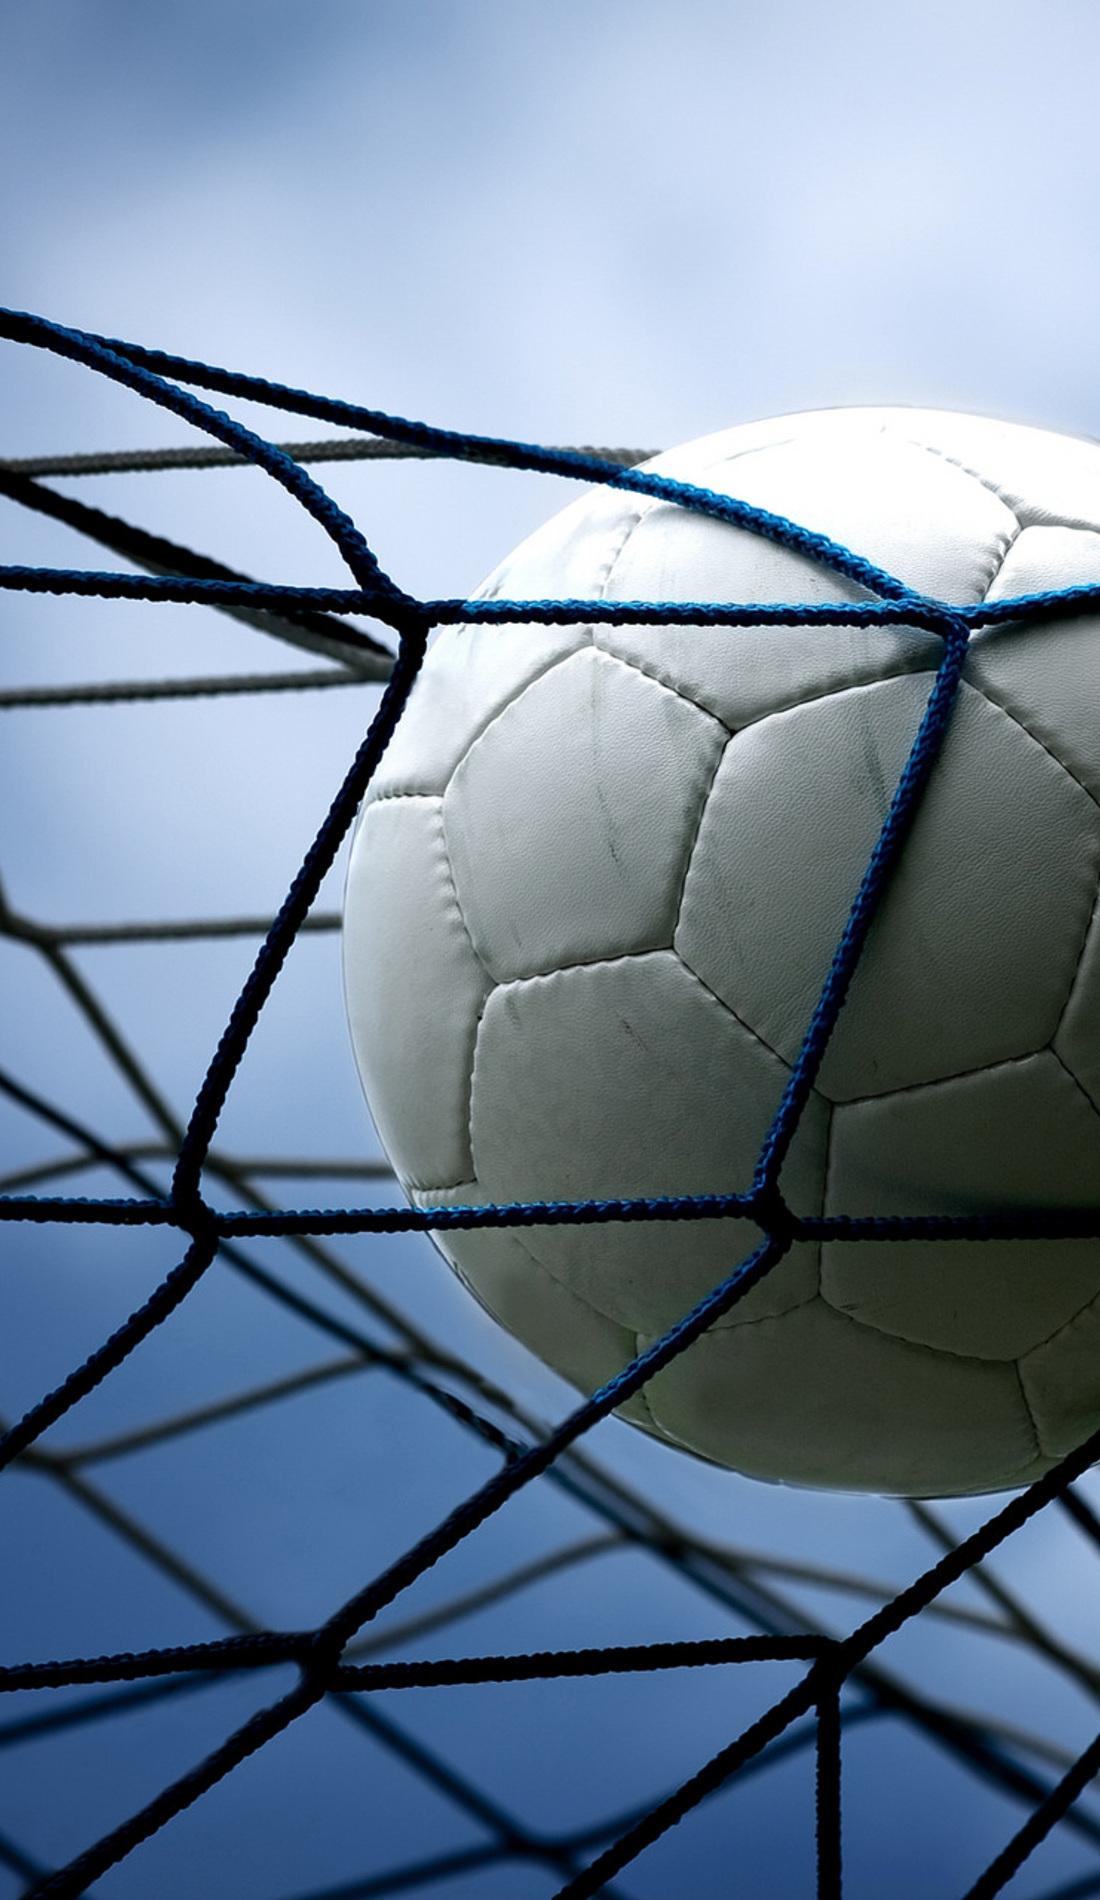 A CONCACAF Champions League live event